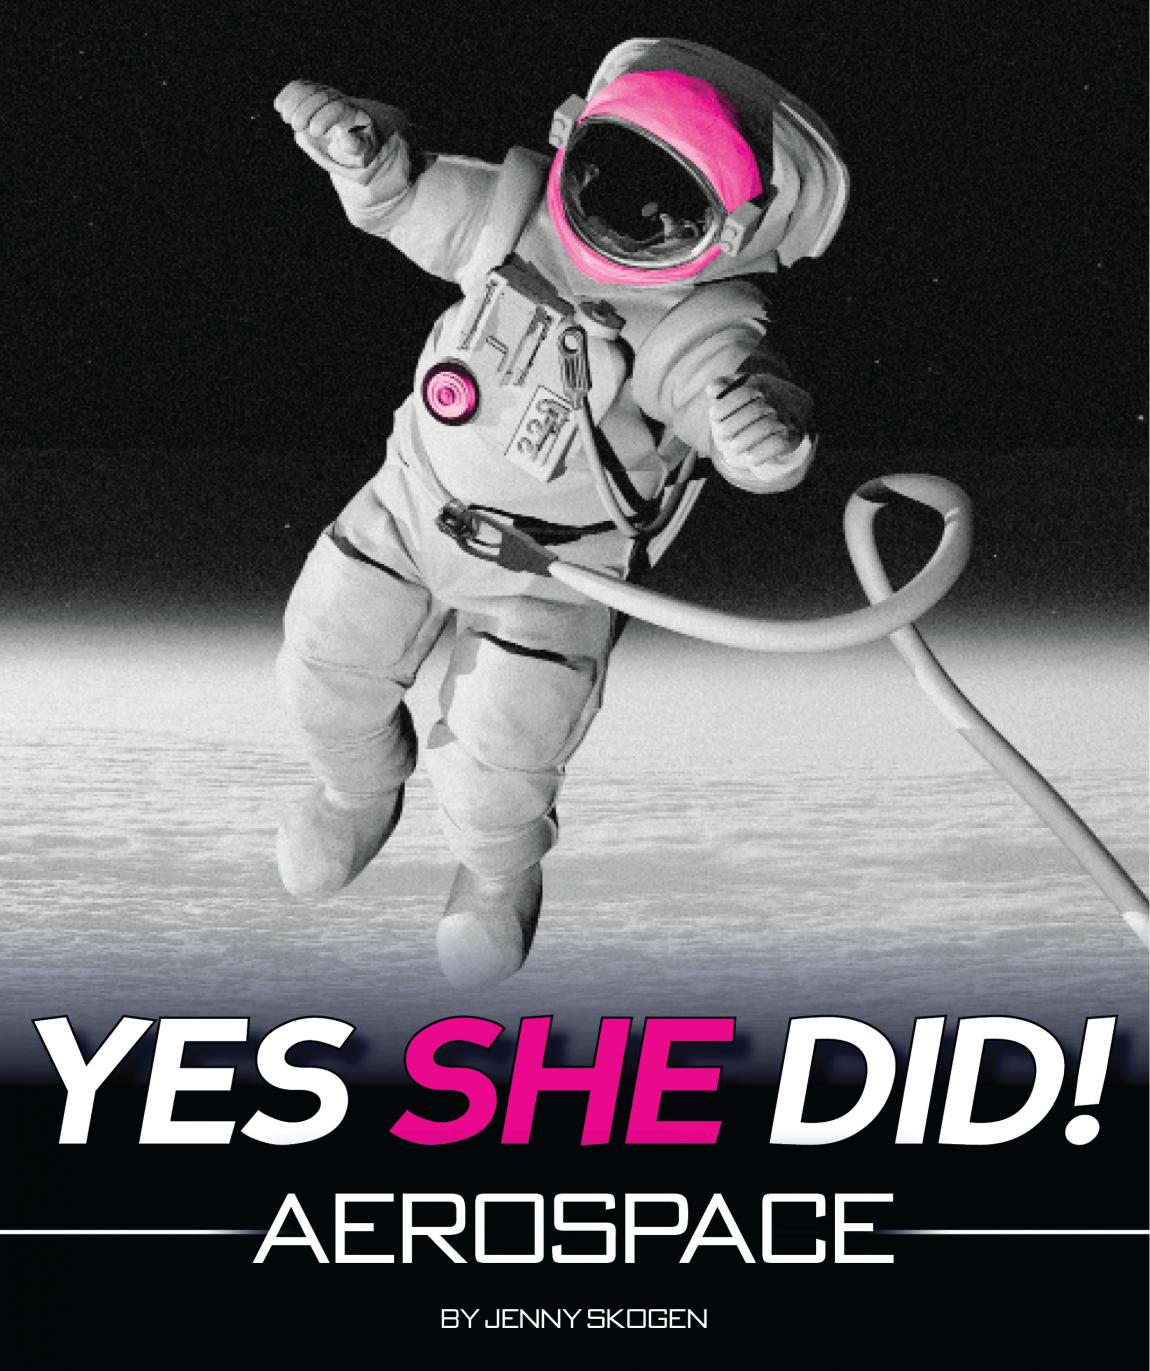 Aerospace-1.png